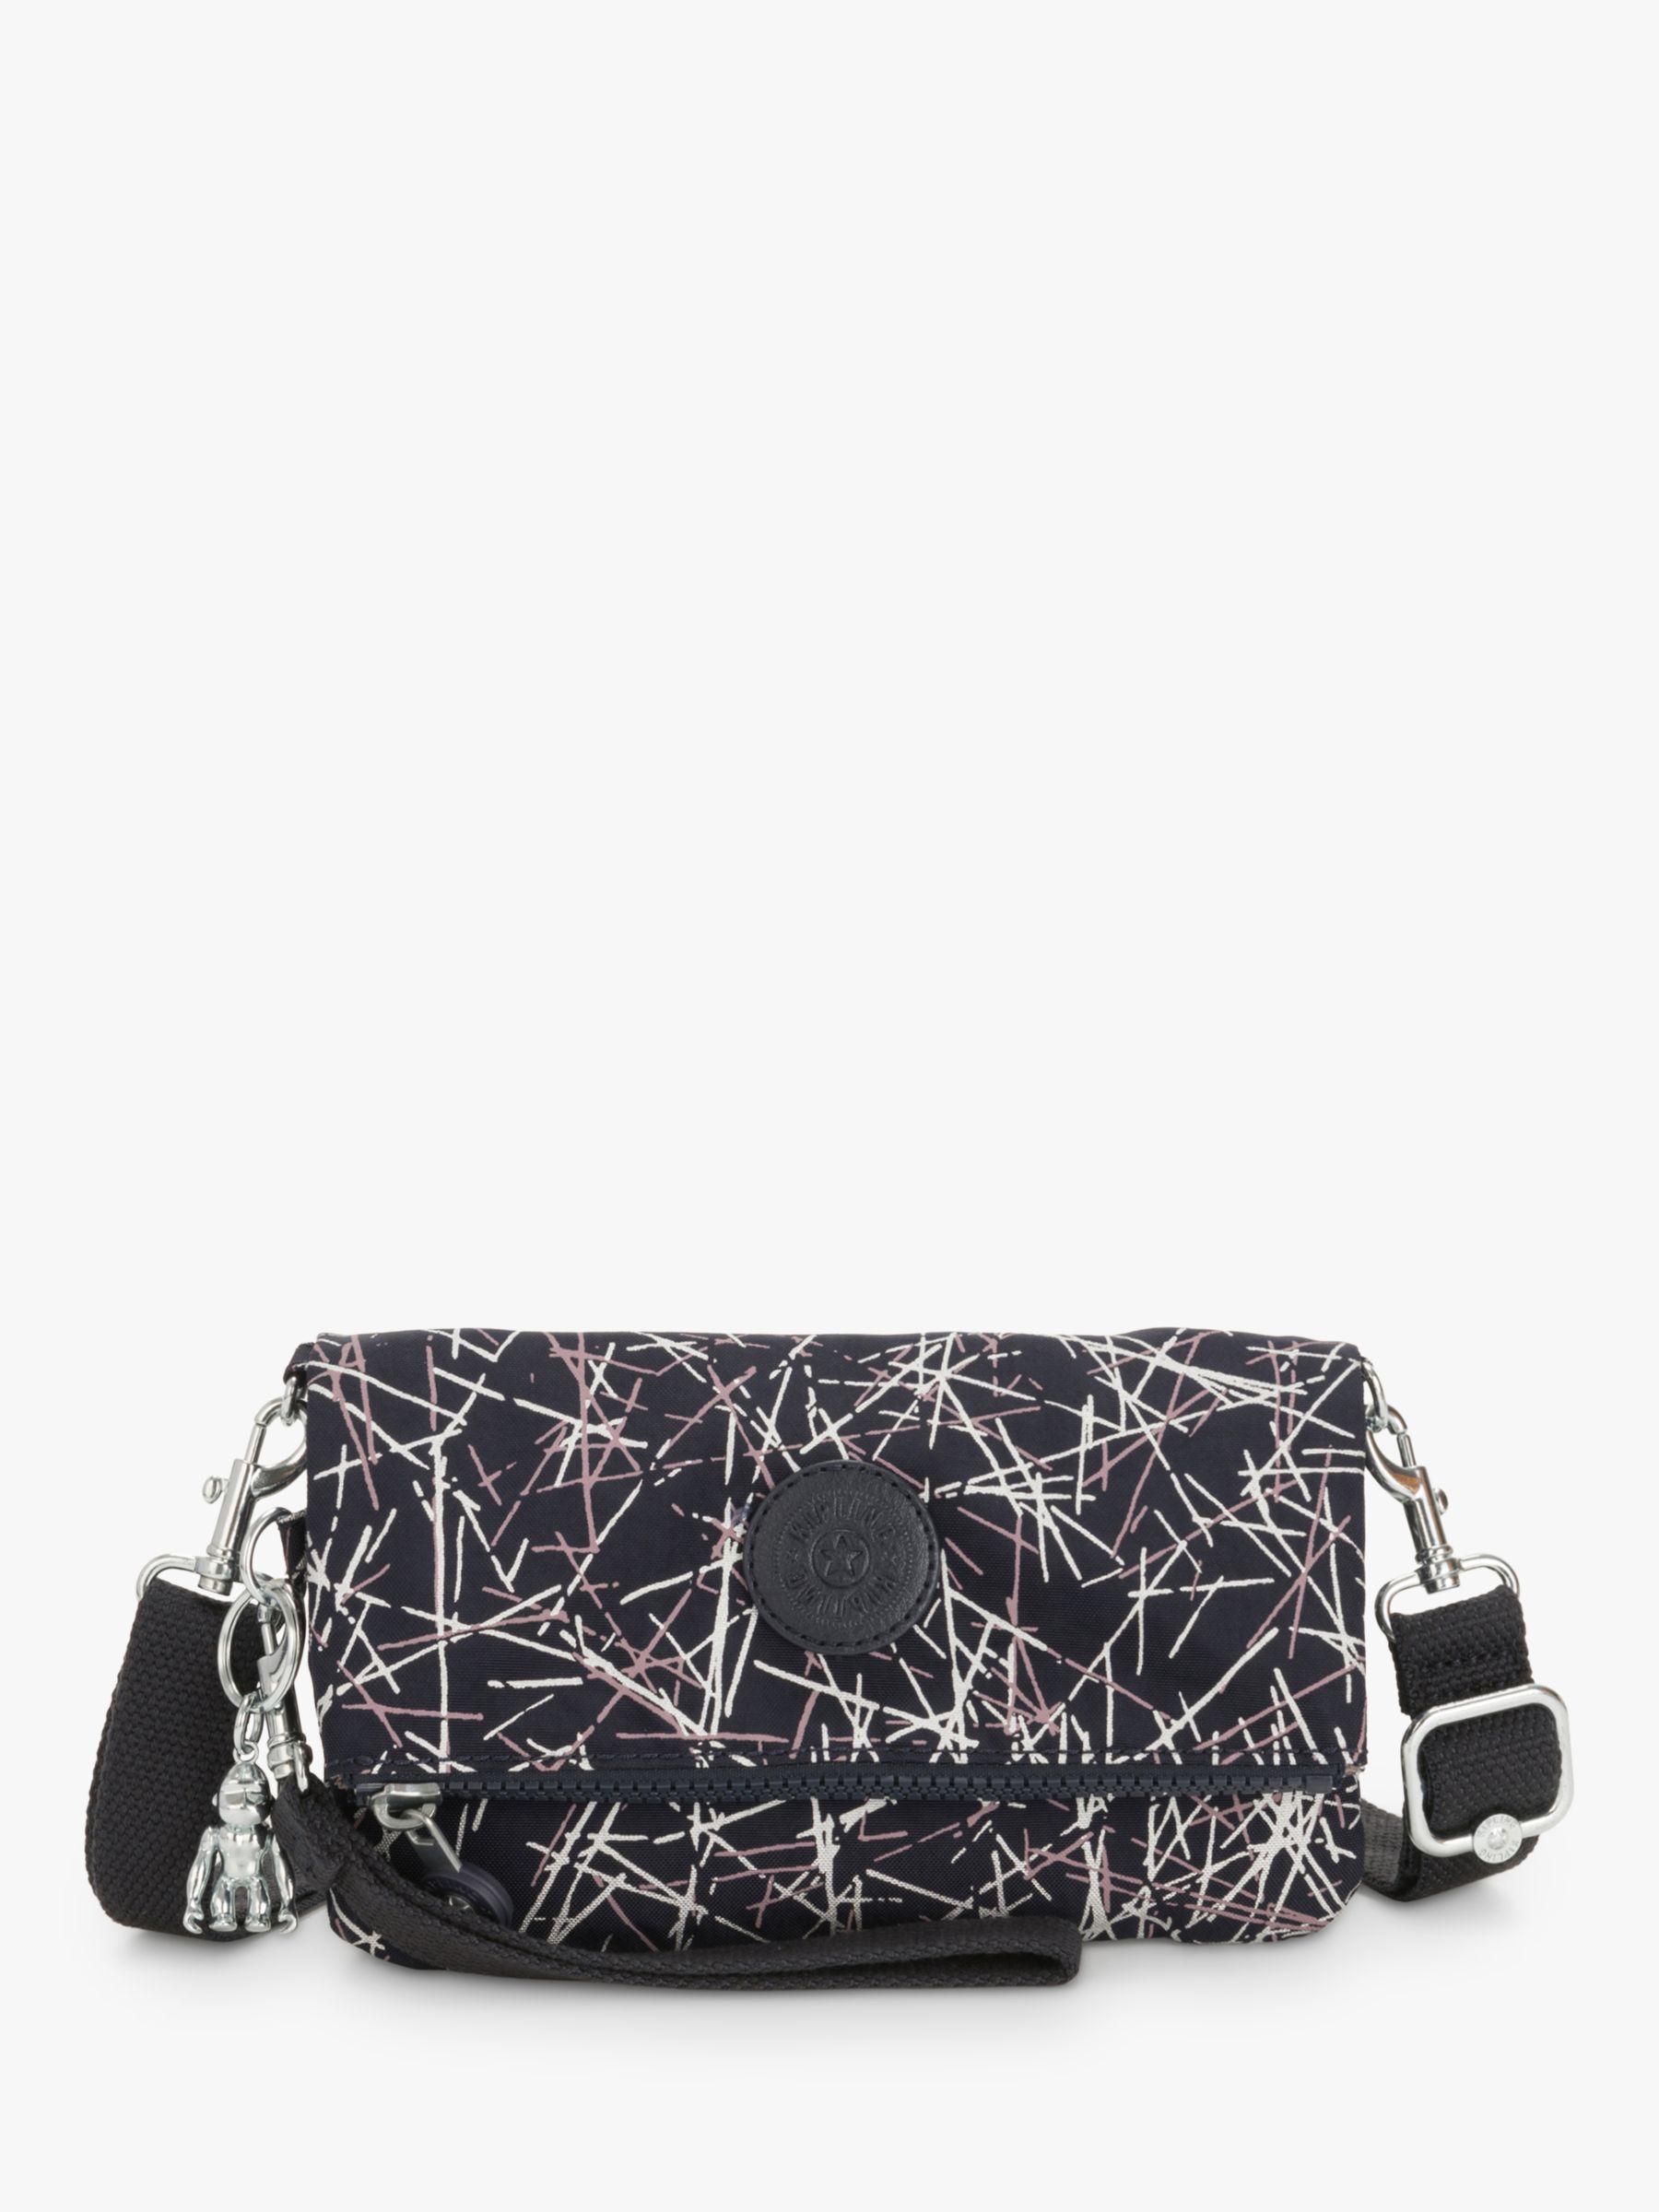 Kipling Kipling Lynne Convertible Cross Body Bag, Navy Stick